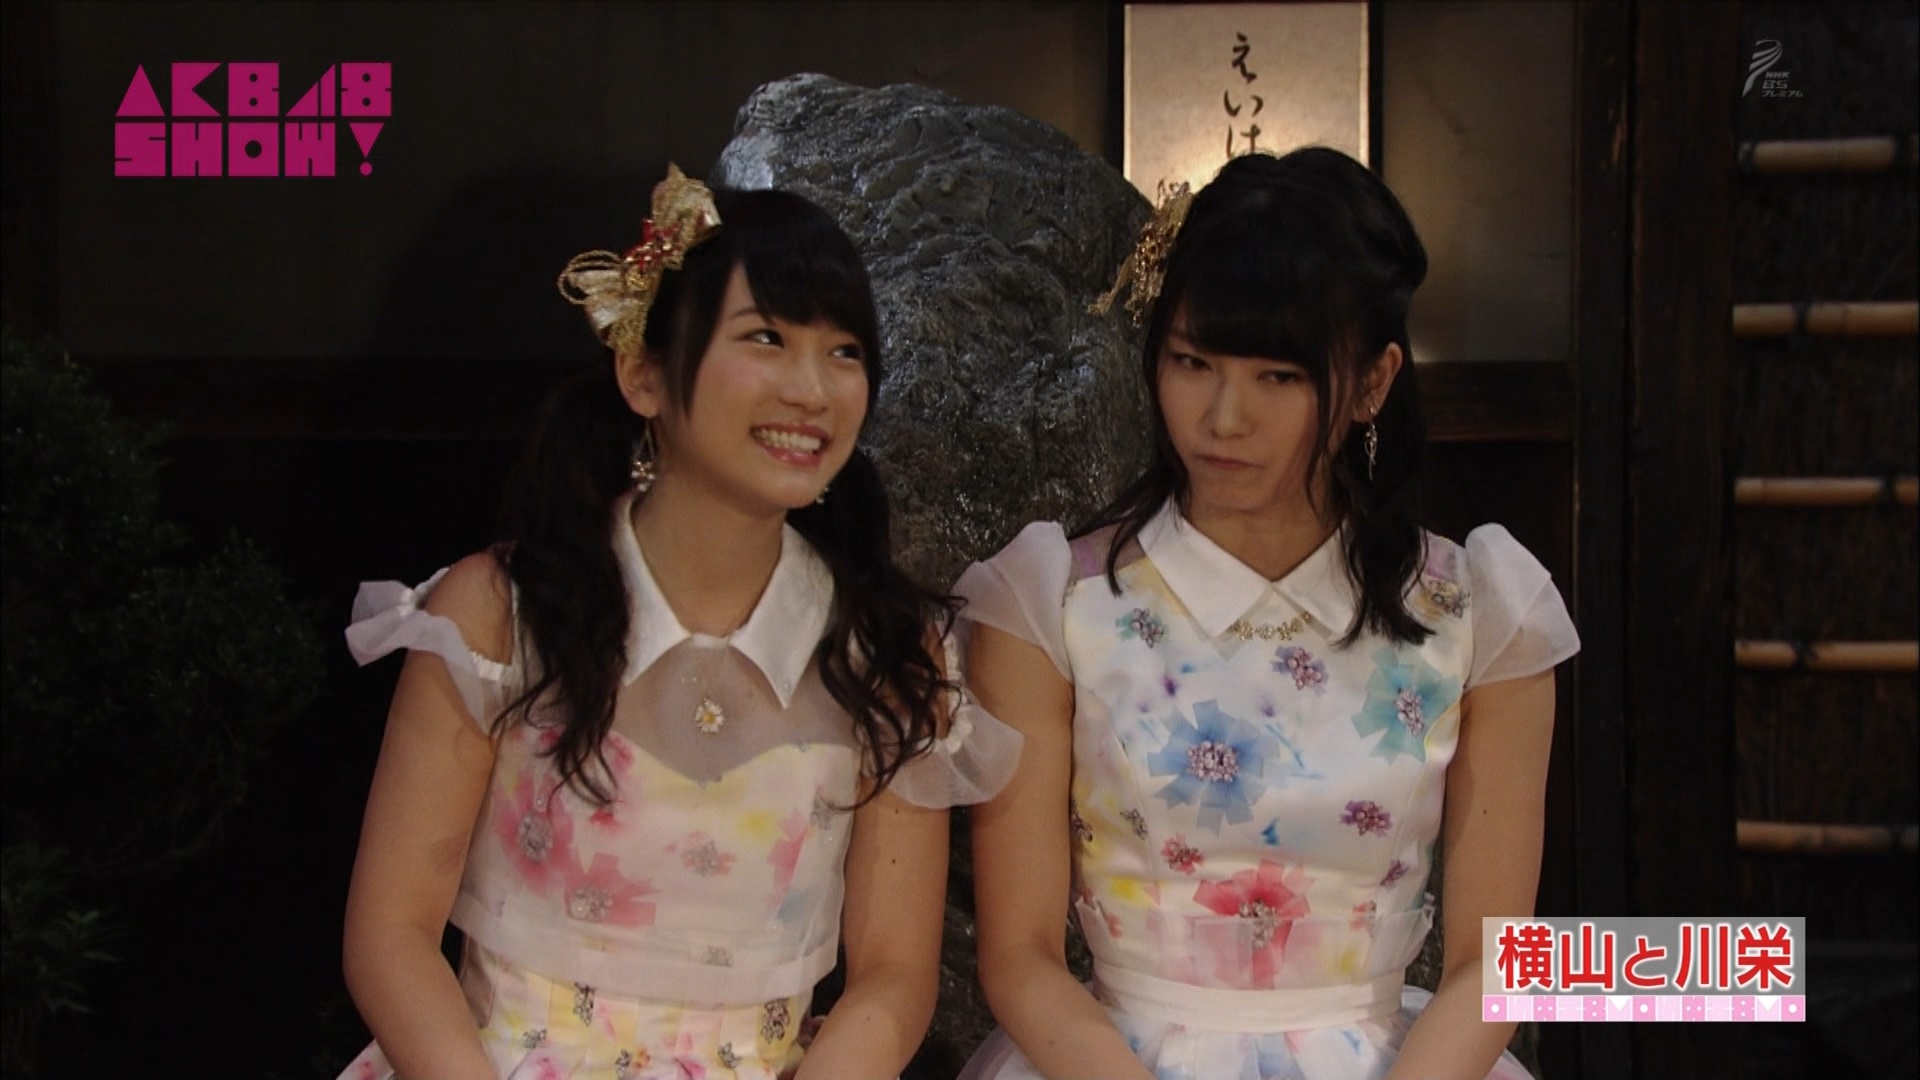 横山由依と川栄李奈 AKB48SHOW! 20140906 (13)